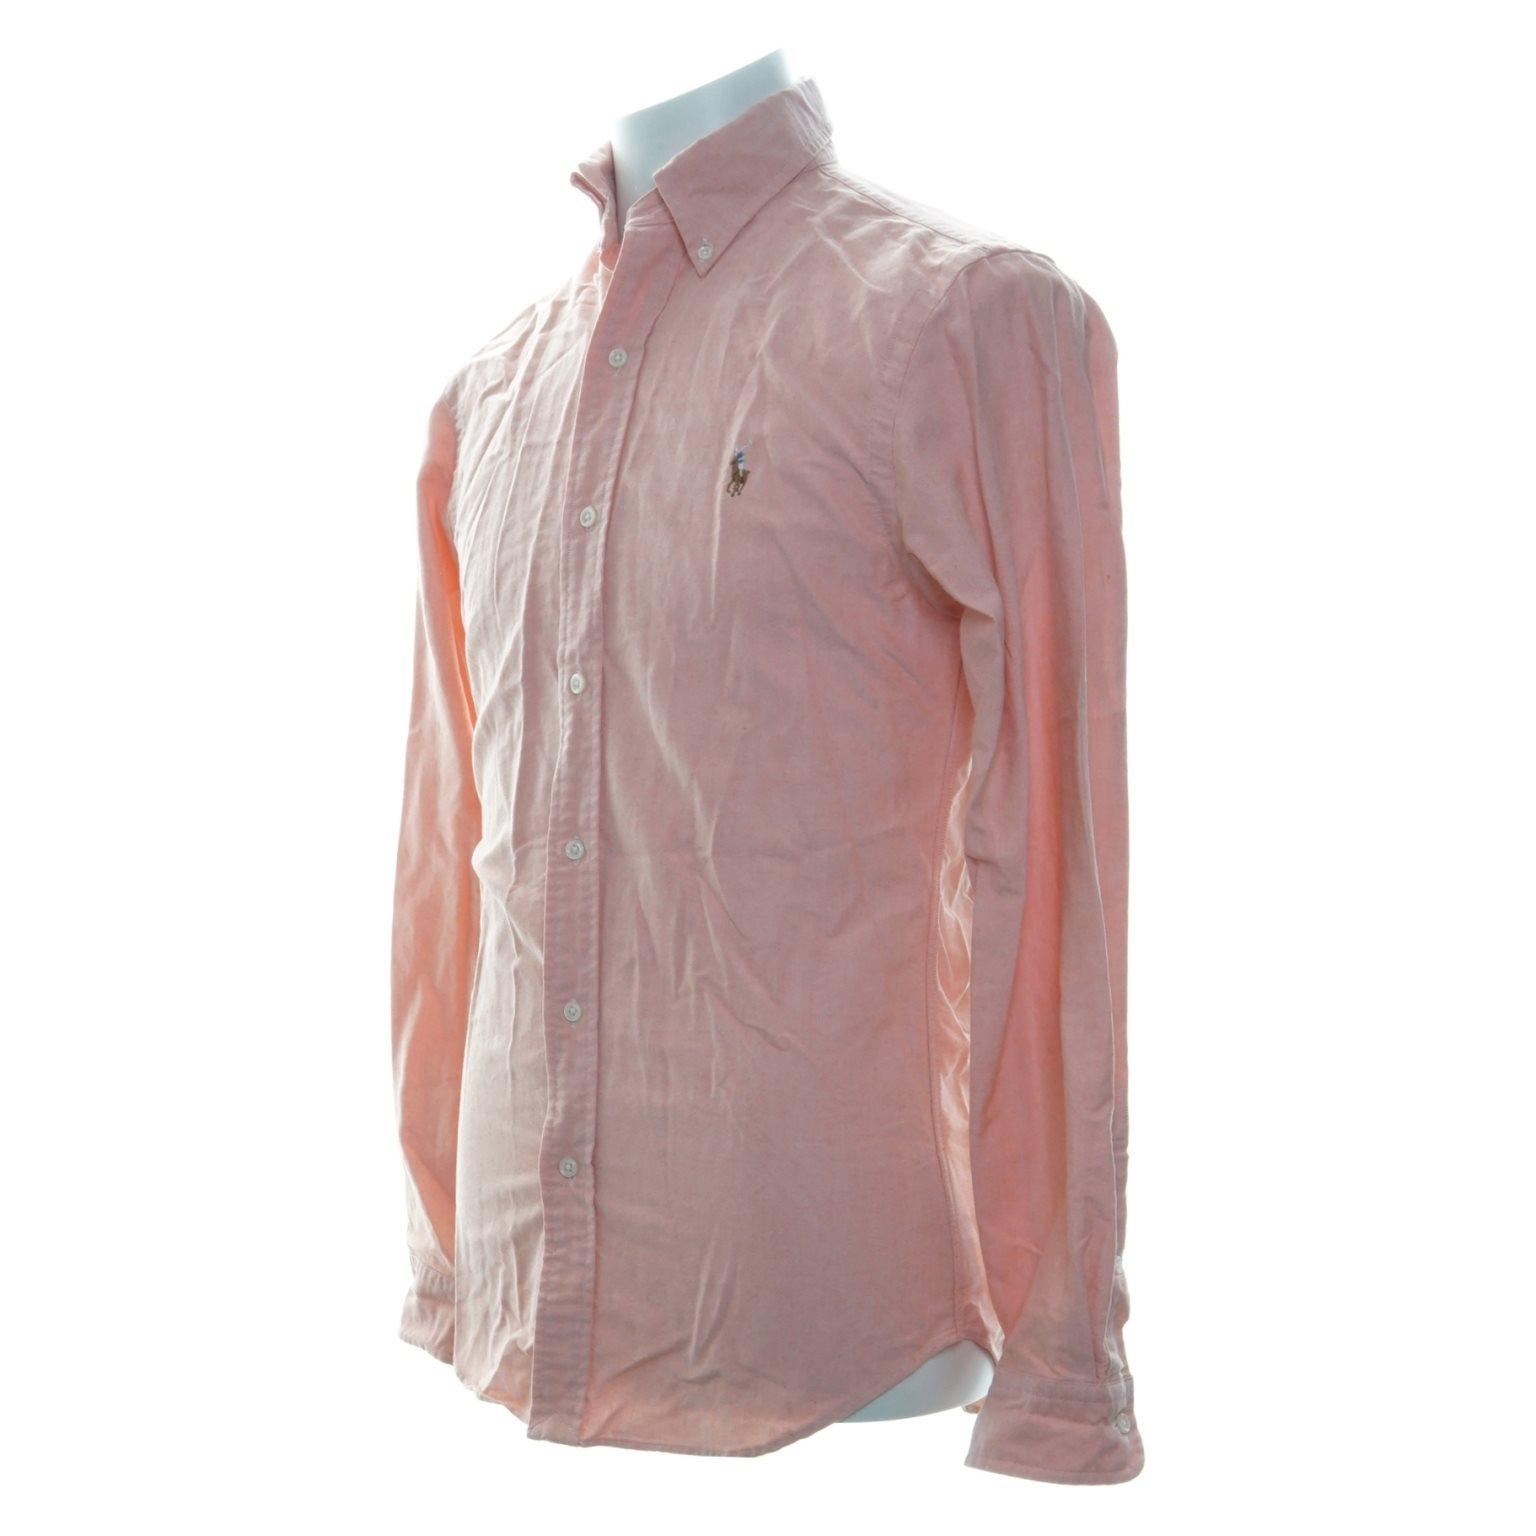 Polo Ralph Lauren, Skjorta, Strl: S, Slim Fit, Fit, Fit, Rosa 9185ce